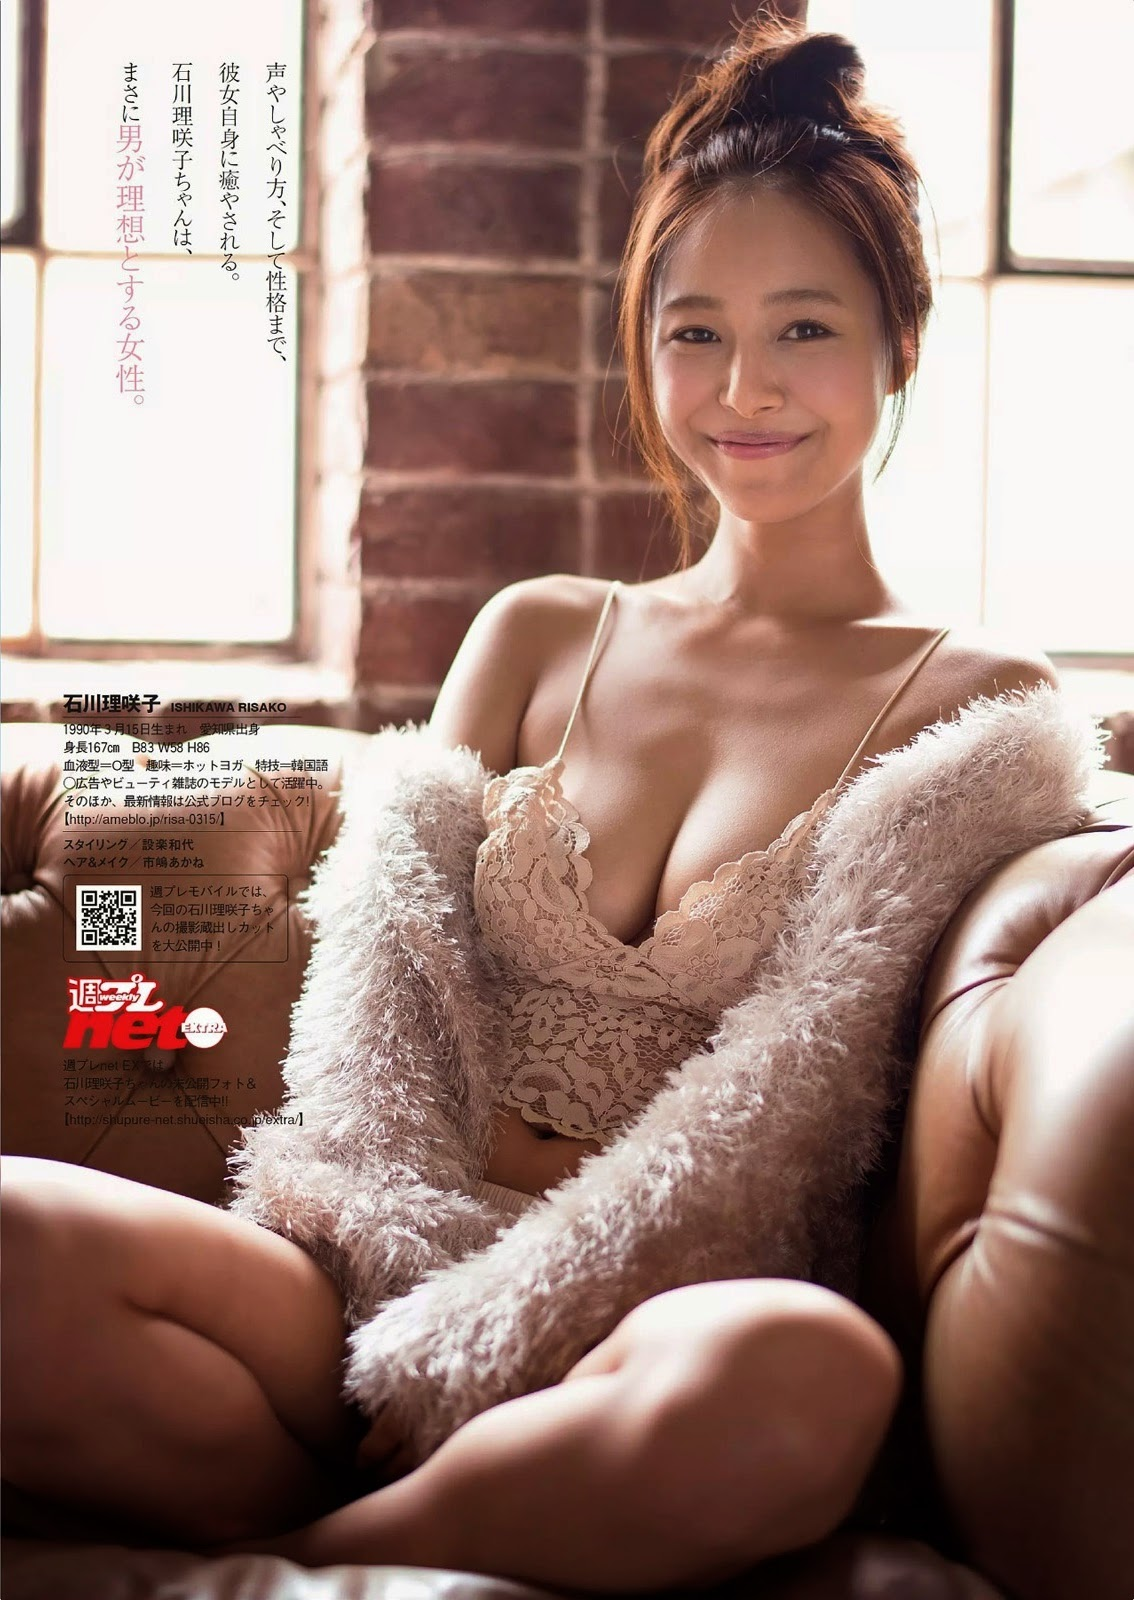 Ishikawa Risako 石川理咲子 Weekly Playboy No 5 2015 Photos 5